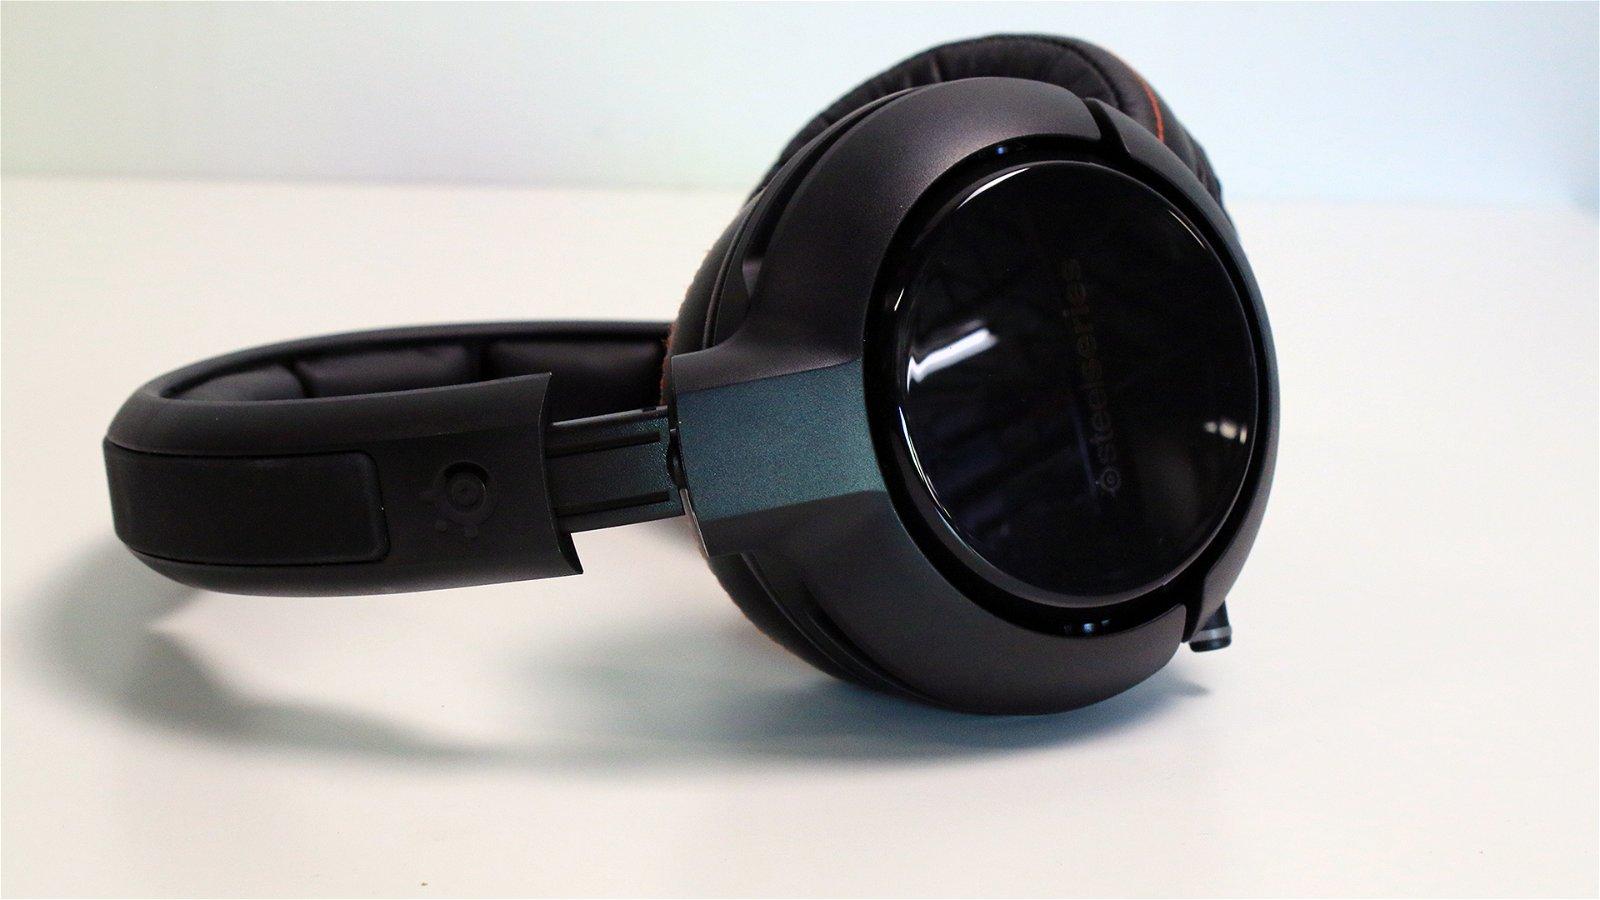 Steelseries Siberia 800 Gaming Headset (Hardware) Review 2